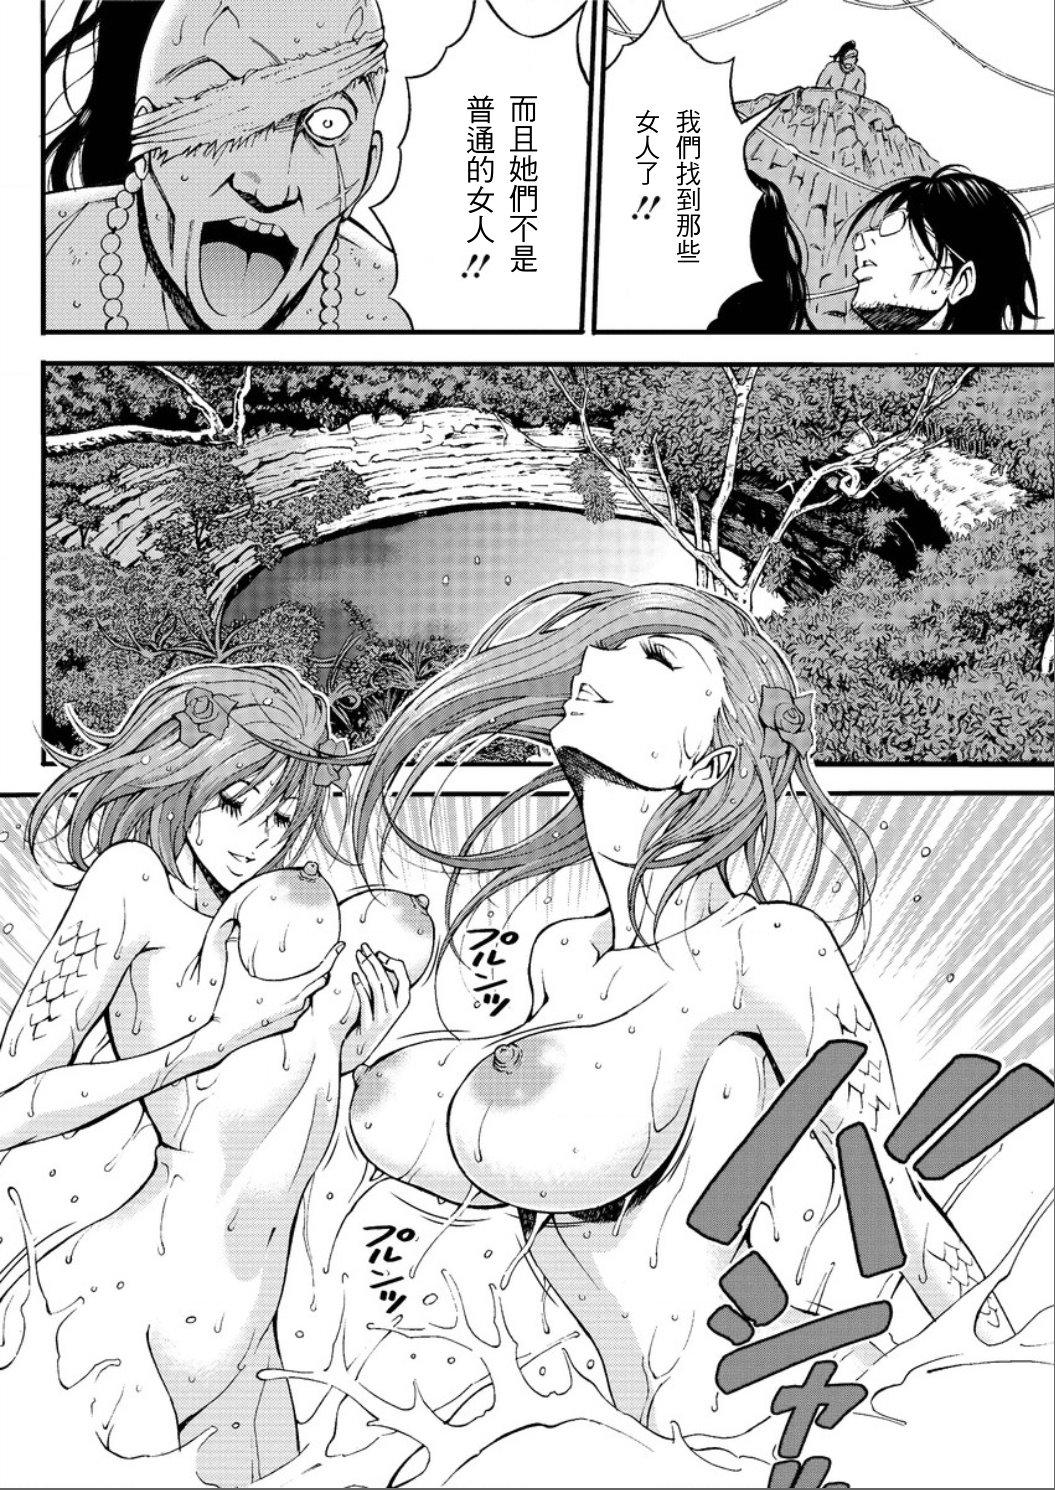 Kigenzen 10000 Nen no Ota | 史前一萬年的宅男 Ch. 19-24 17